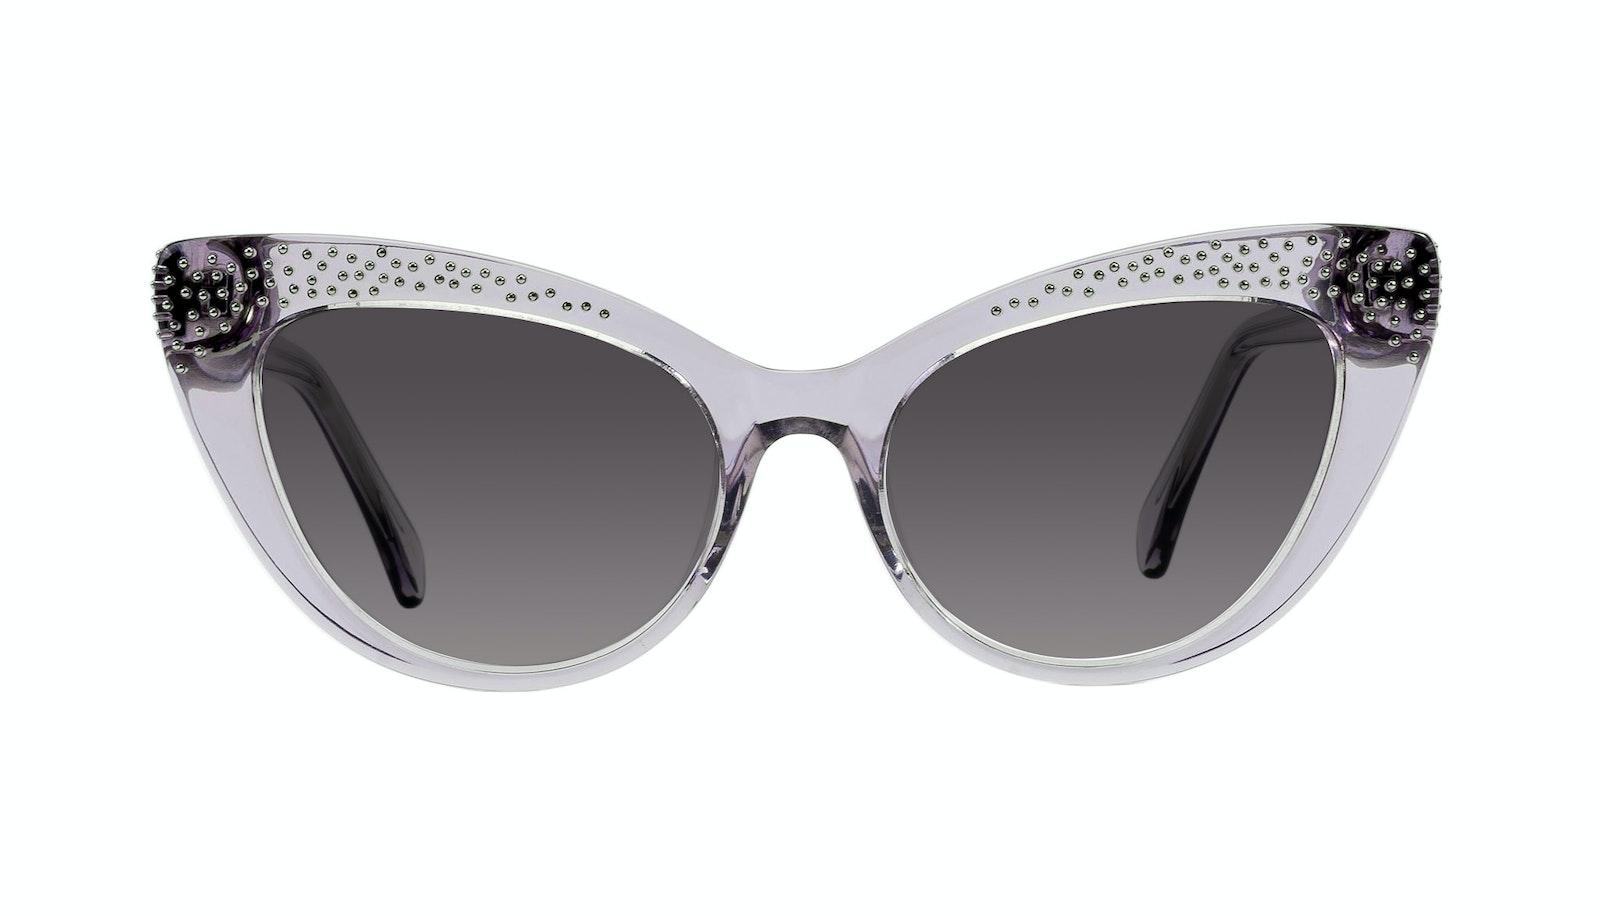 Affordable Fashion Glasses Cat Eye Daring Cateye Sunglasses Women Keiko Moe May